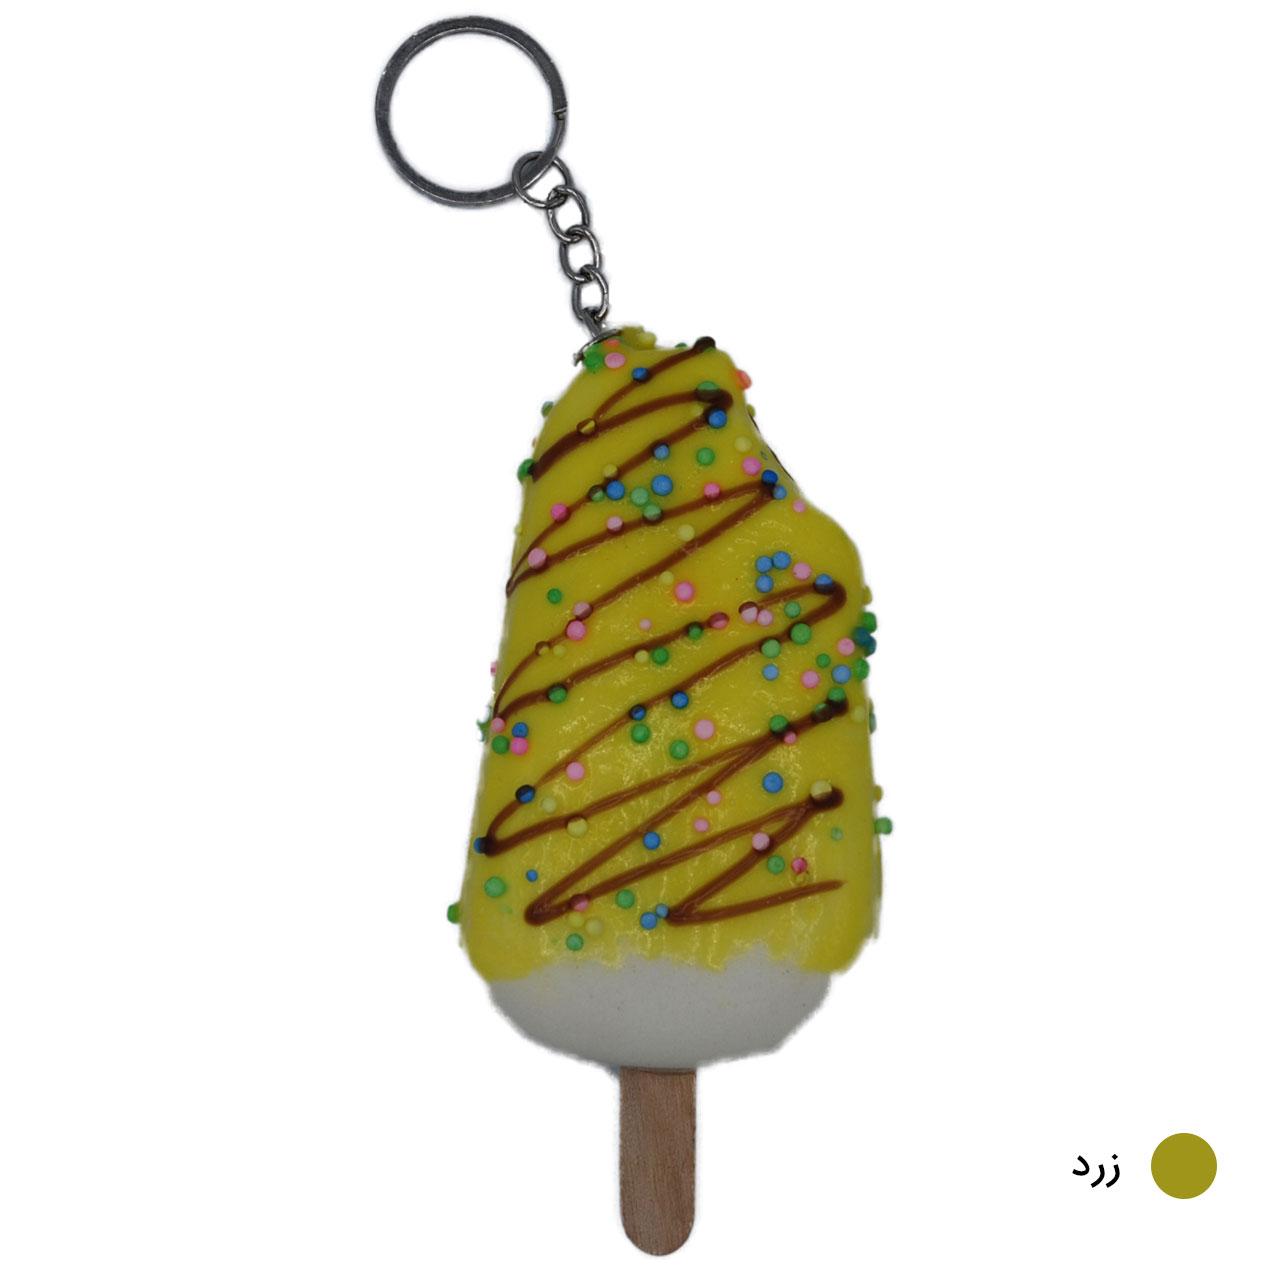 آویز عروسکی مدل بستنی یخی کد B10042